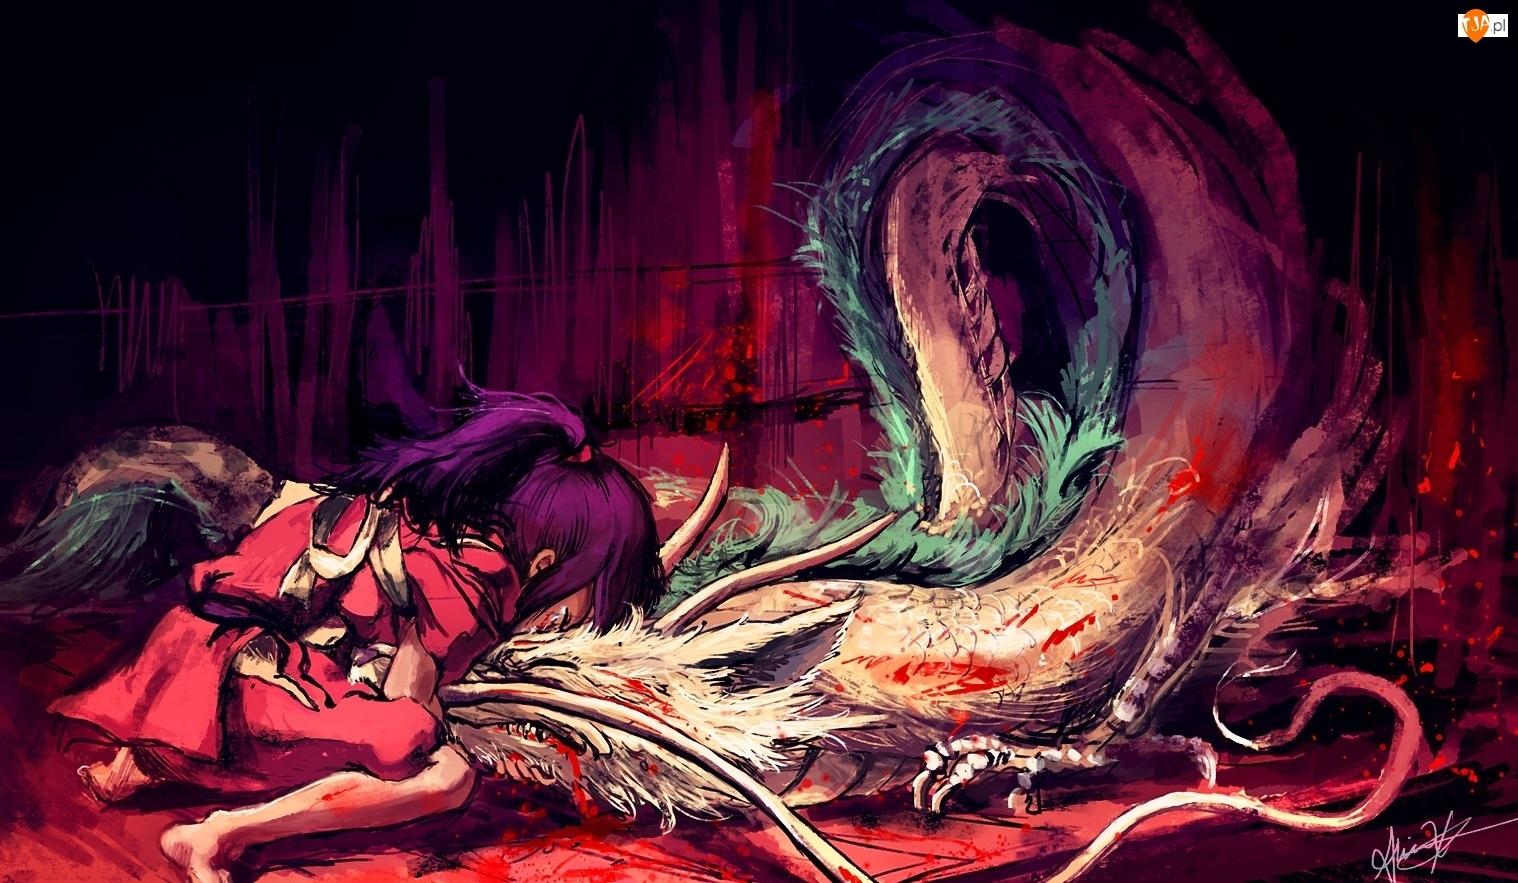 Alice X. Zhang, Spirited Away